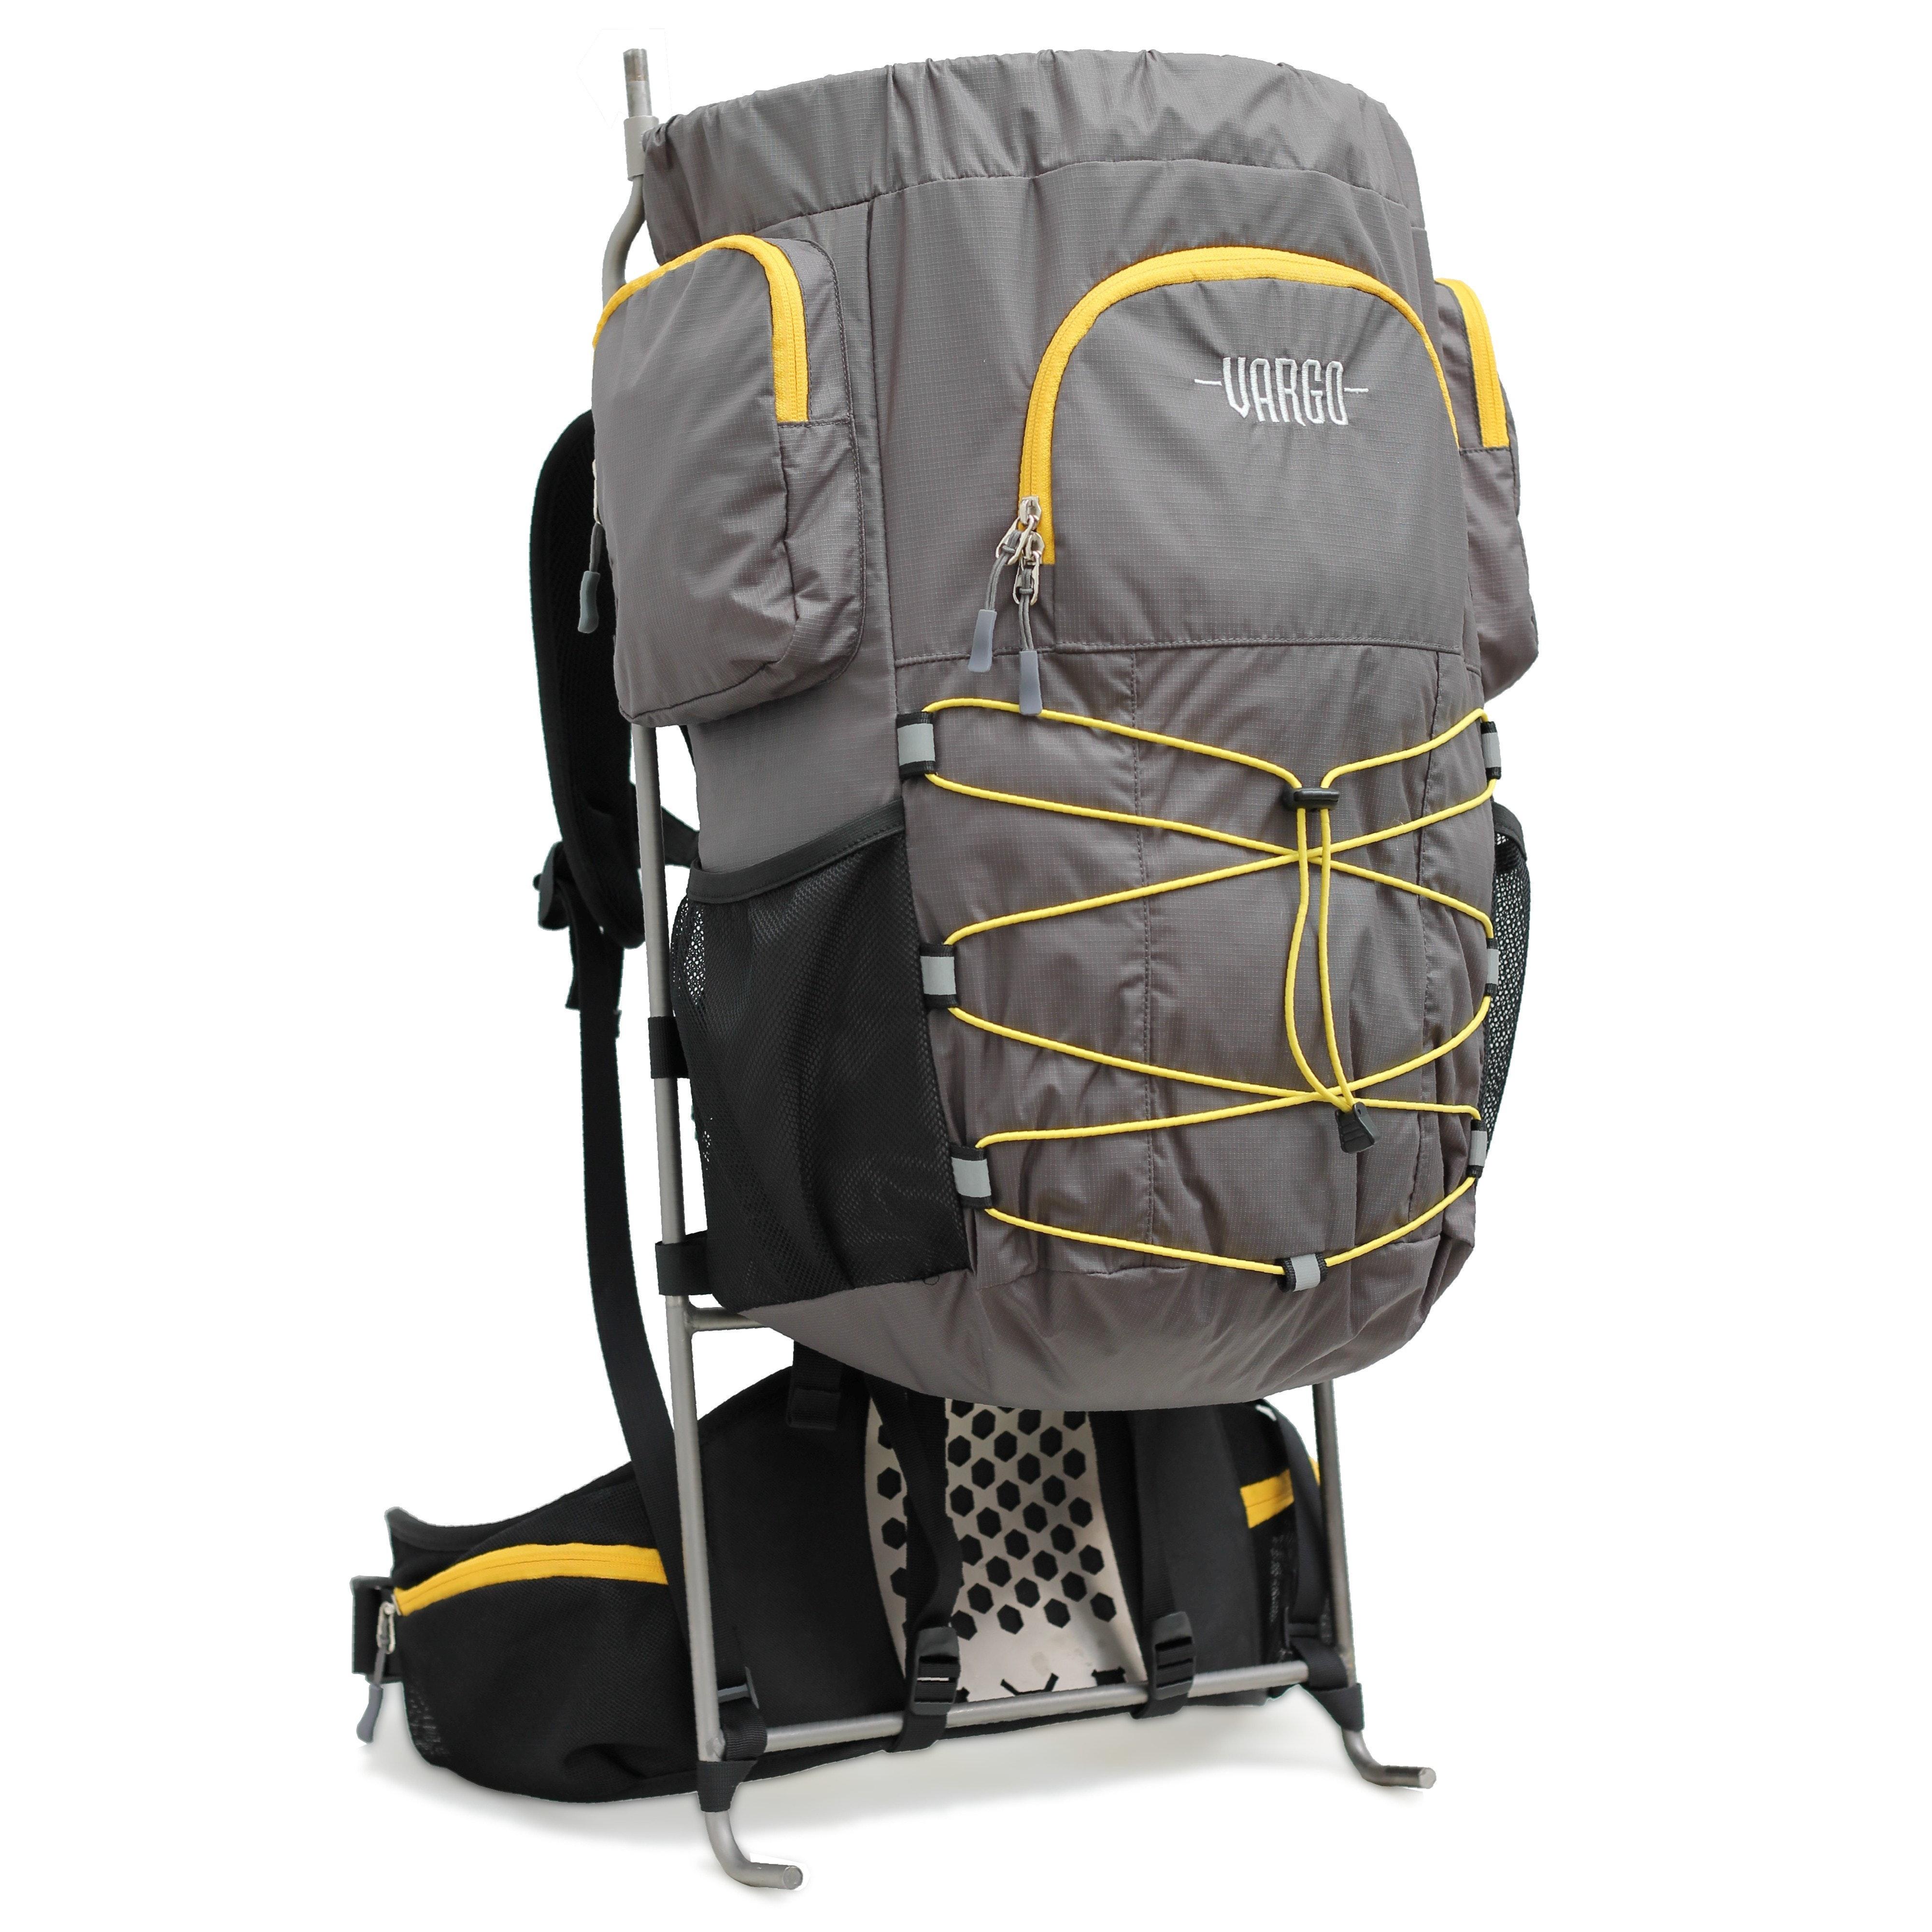 Ti-Arc Backpack | Titanium External Frame Backpack | Ultralight Backpack  - Varg